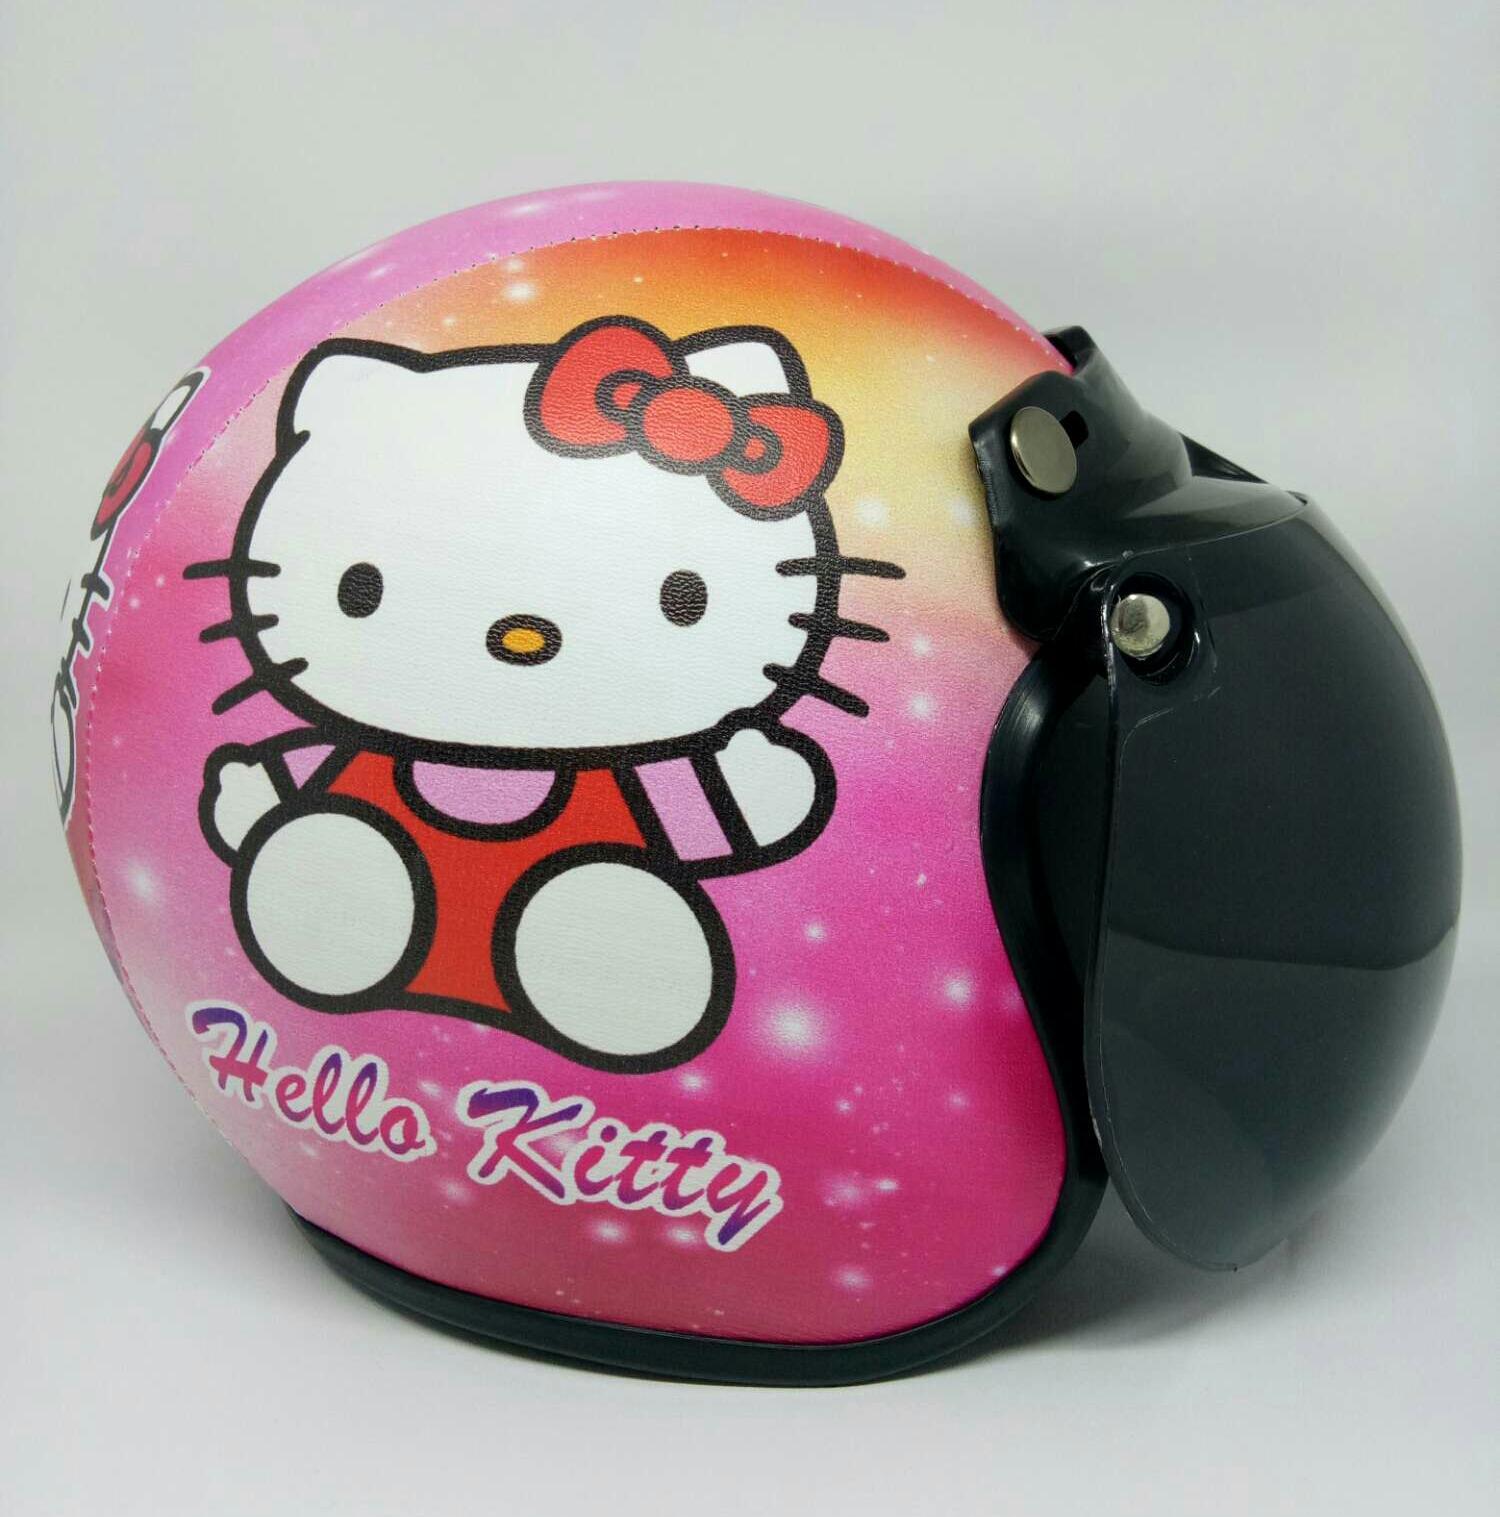 Helm Bogo Anak 2-10 tahun Motif Hello kitty Pink Kaca Anak